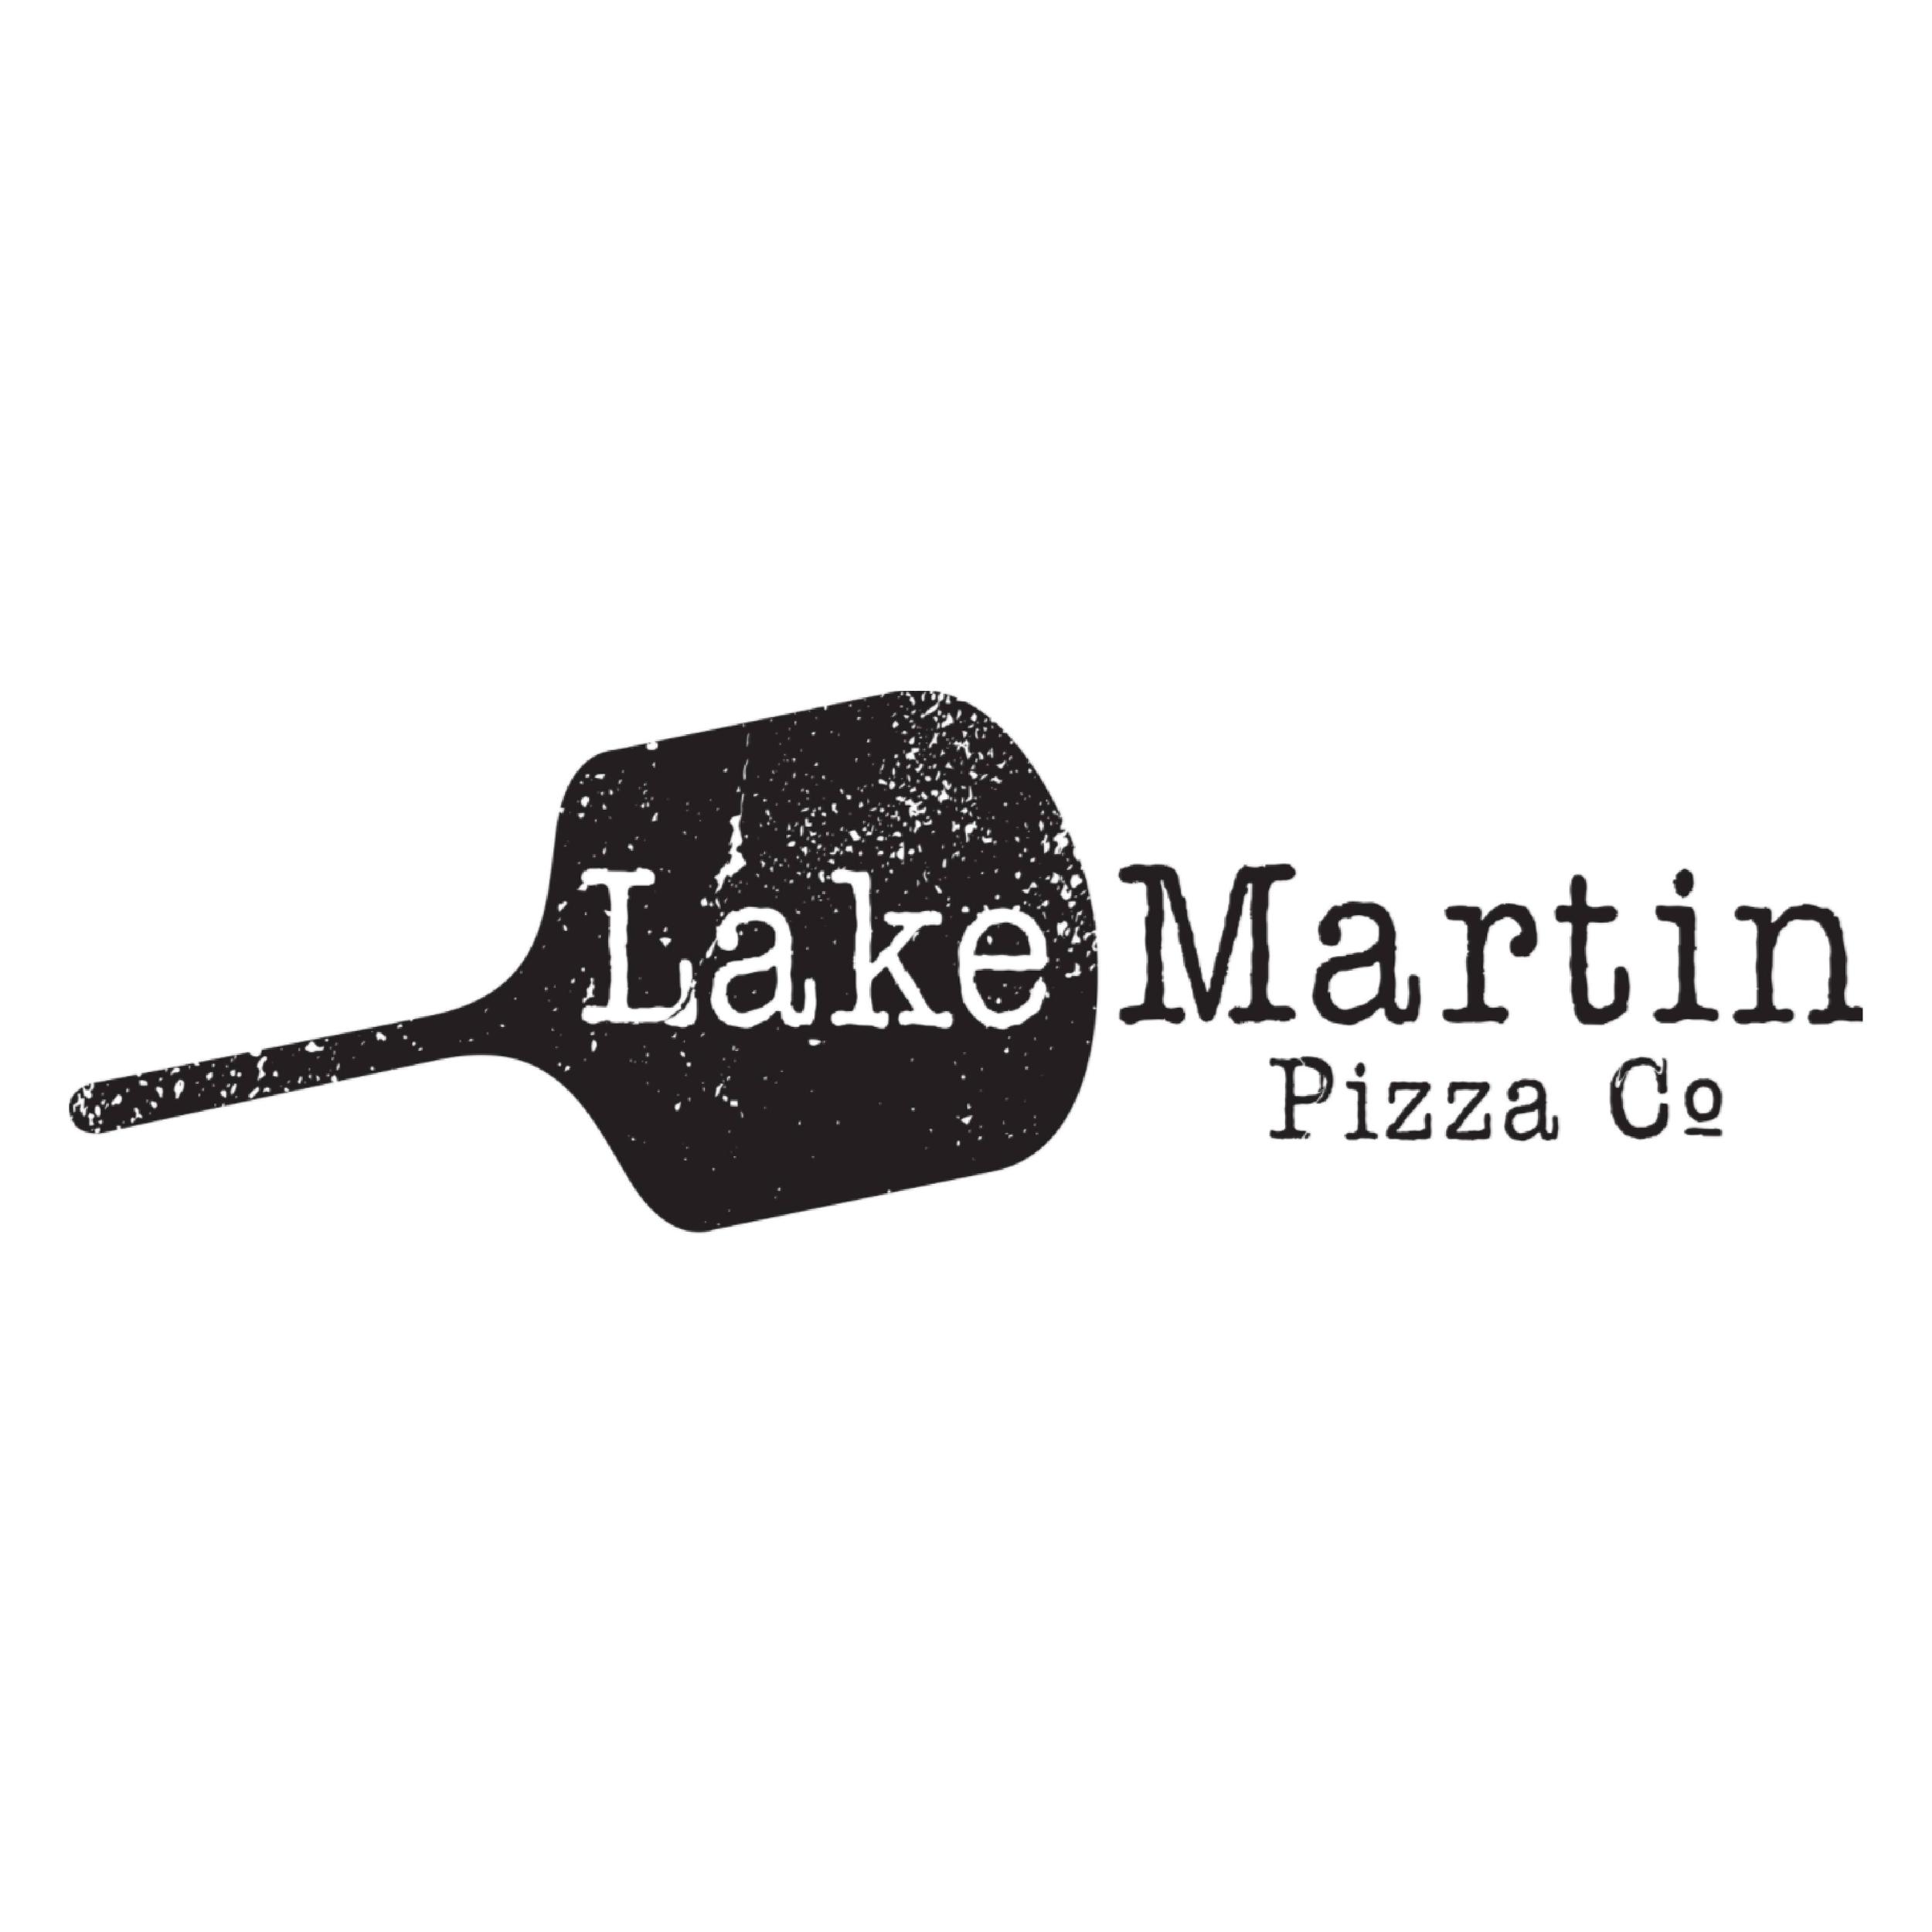 Lake Martin Pizza Co